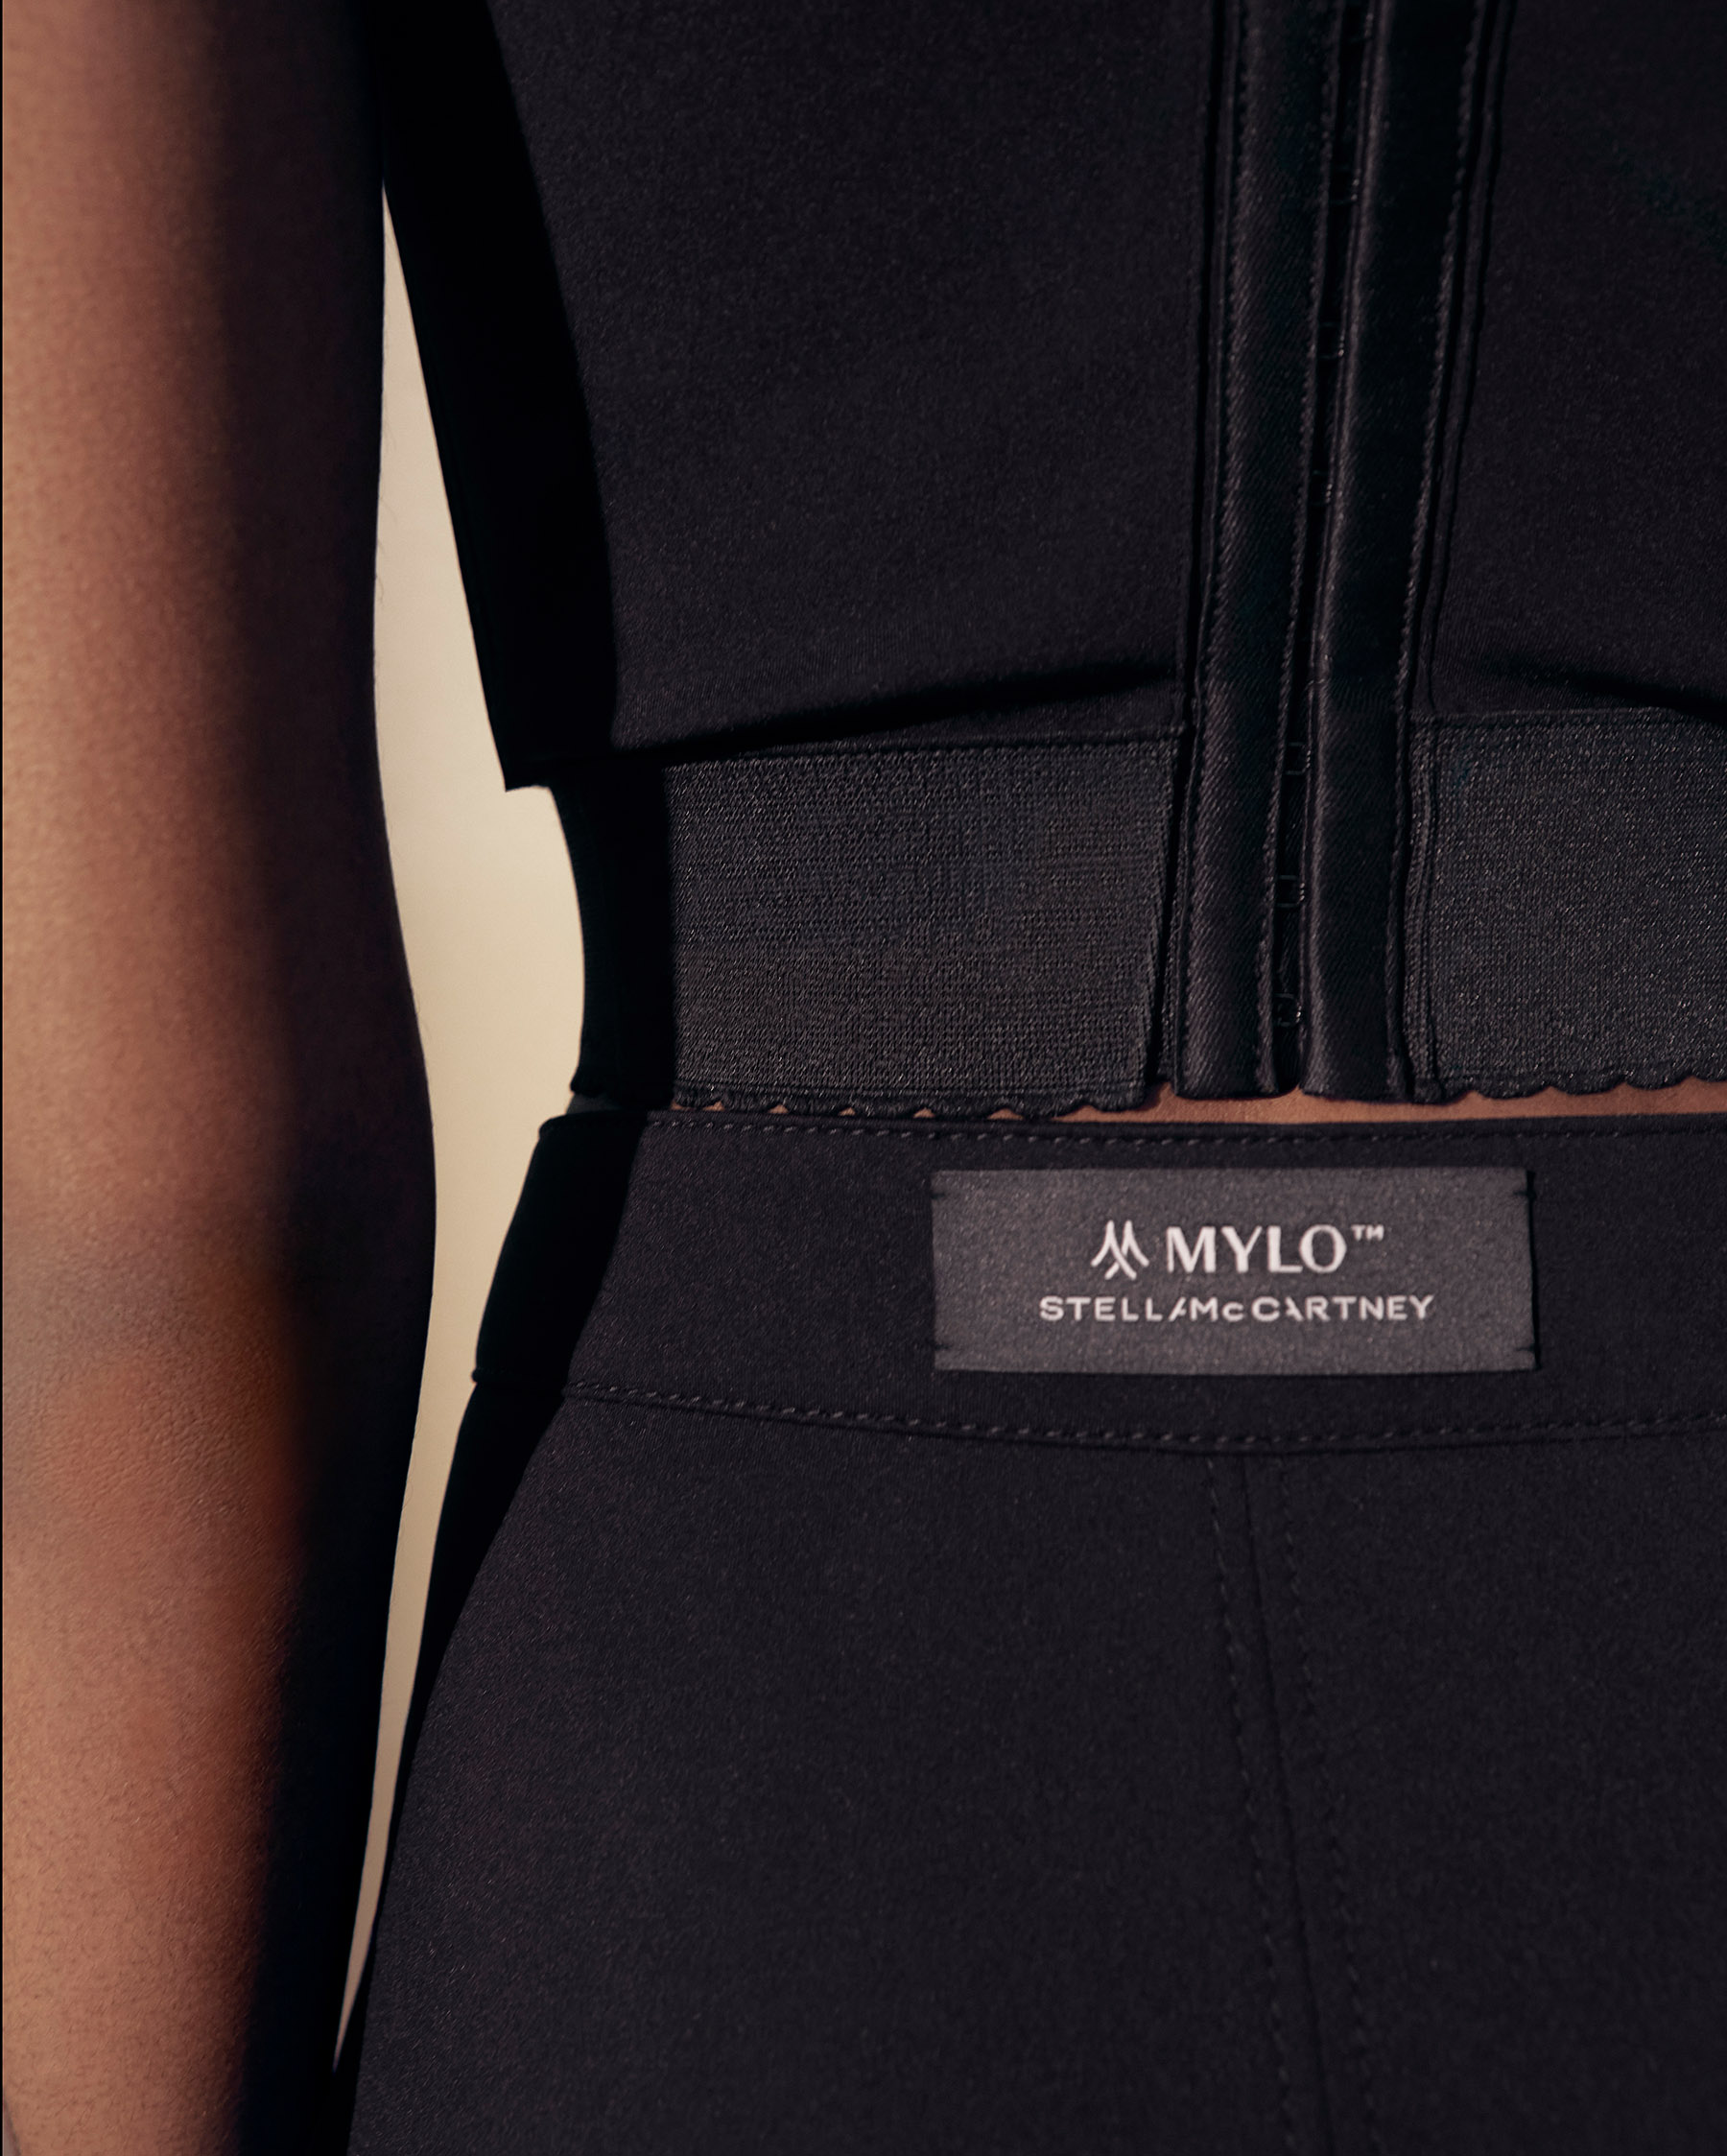 Stella McCartney Launches 1st Garments Made From Vegan Mylo Mycelium Leather